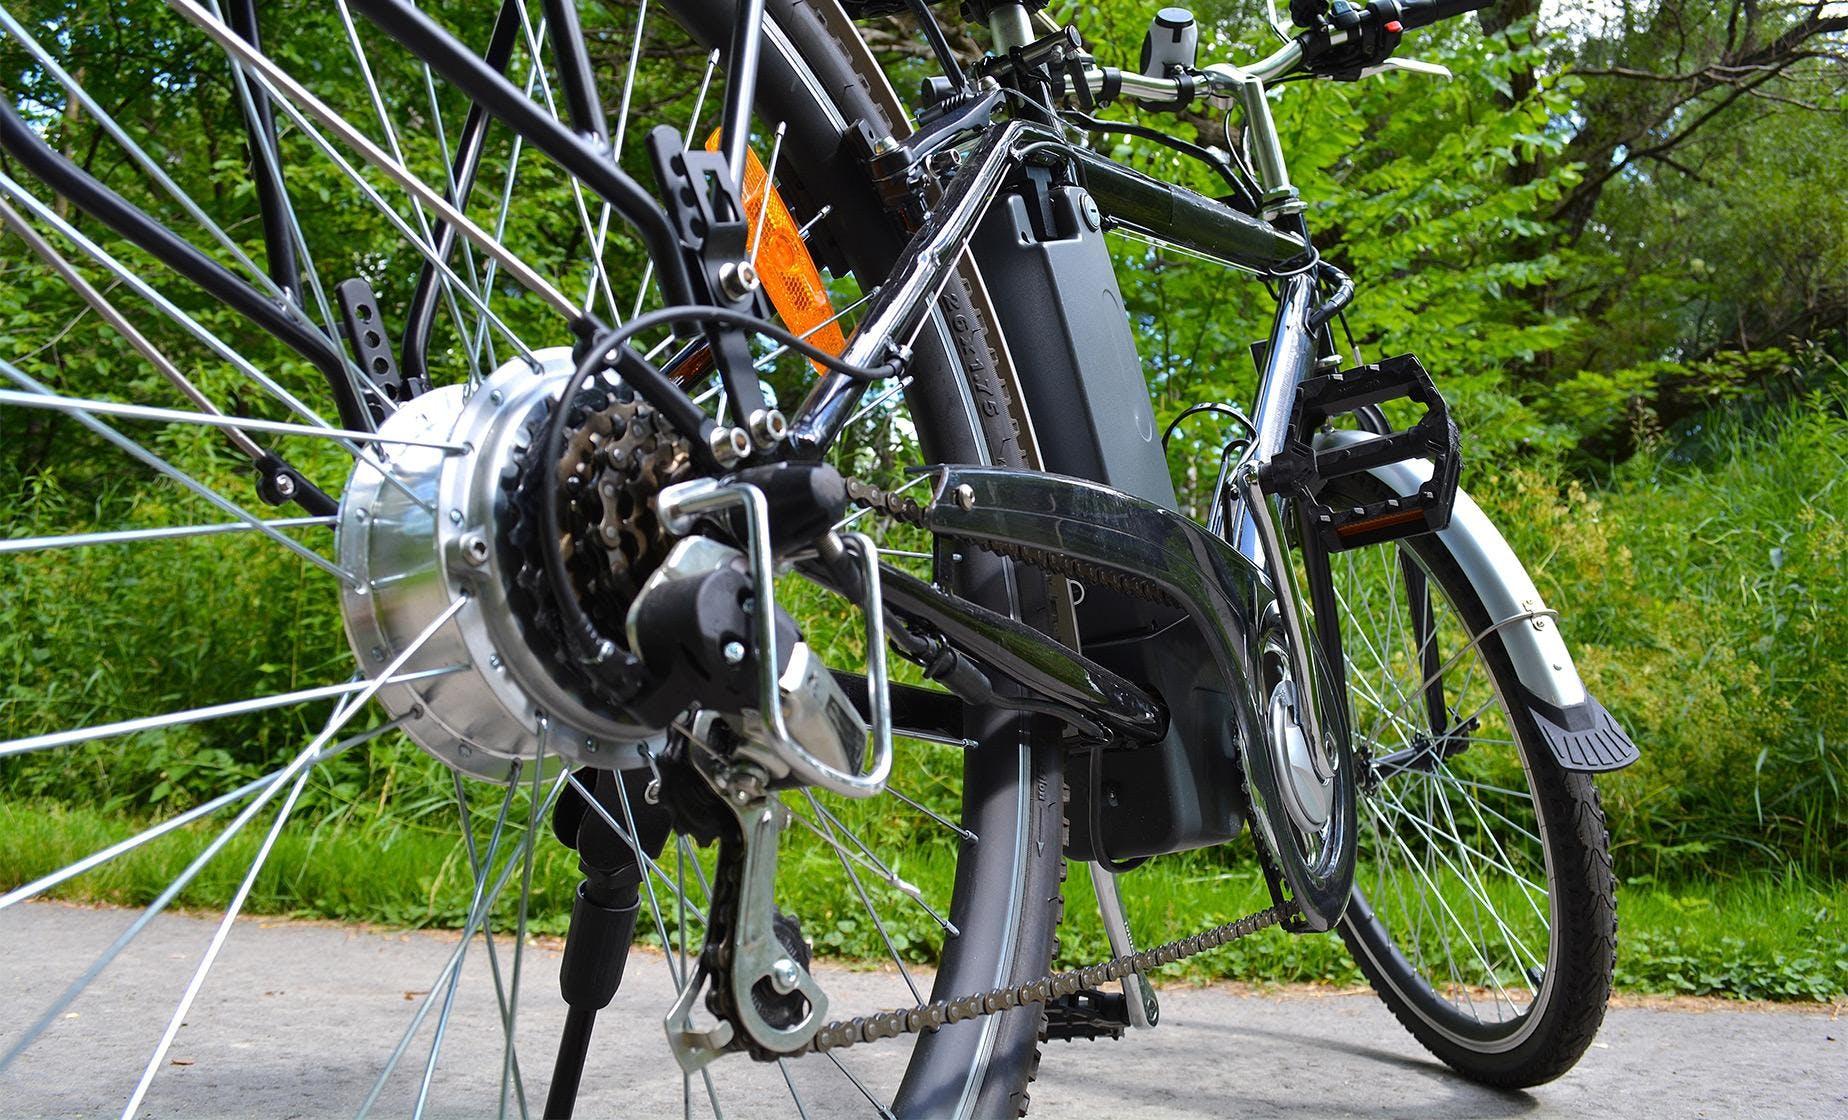 E-Biking in the Parks